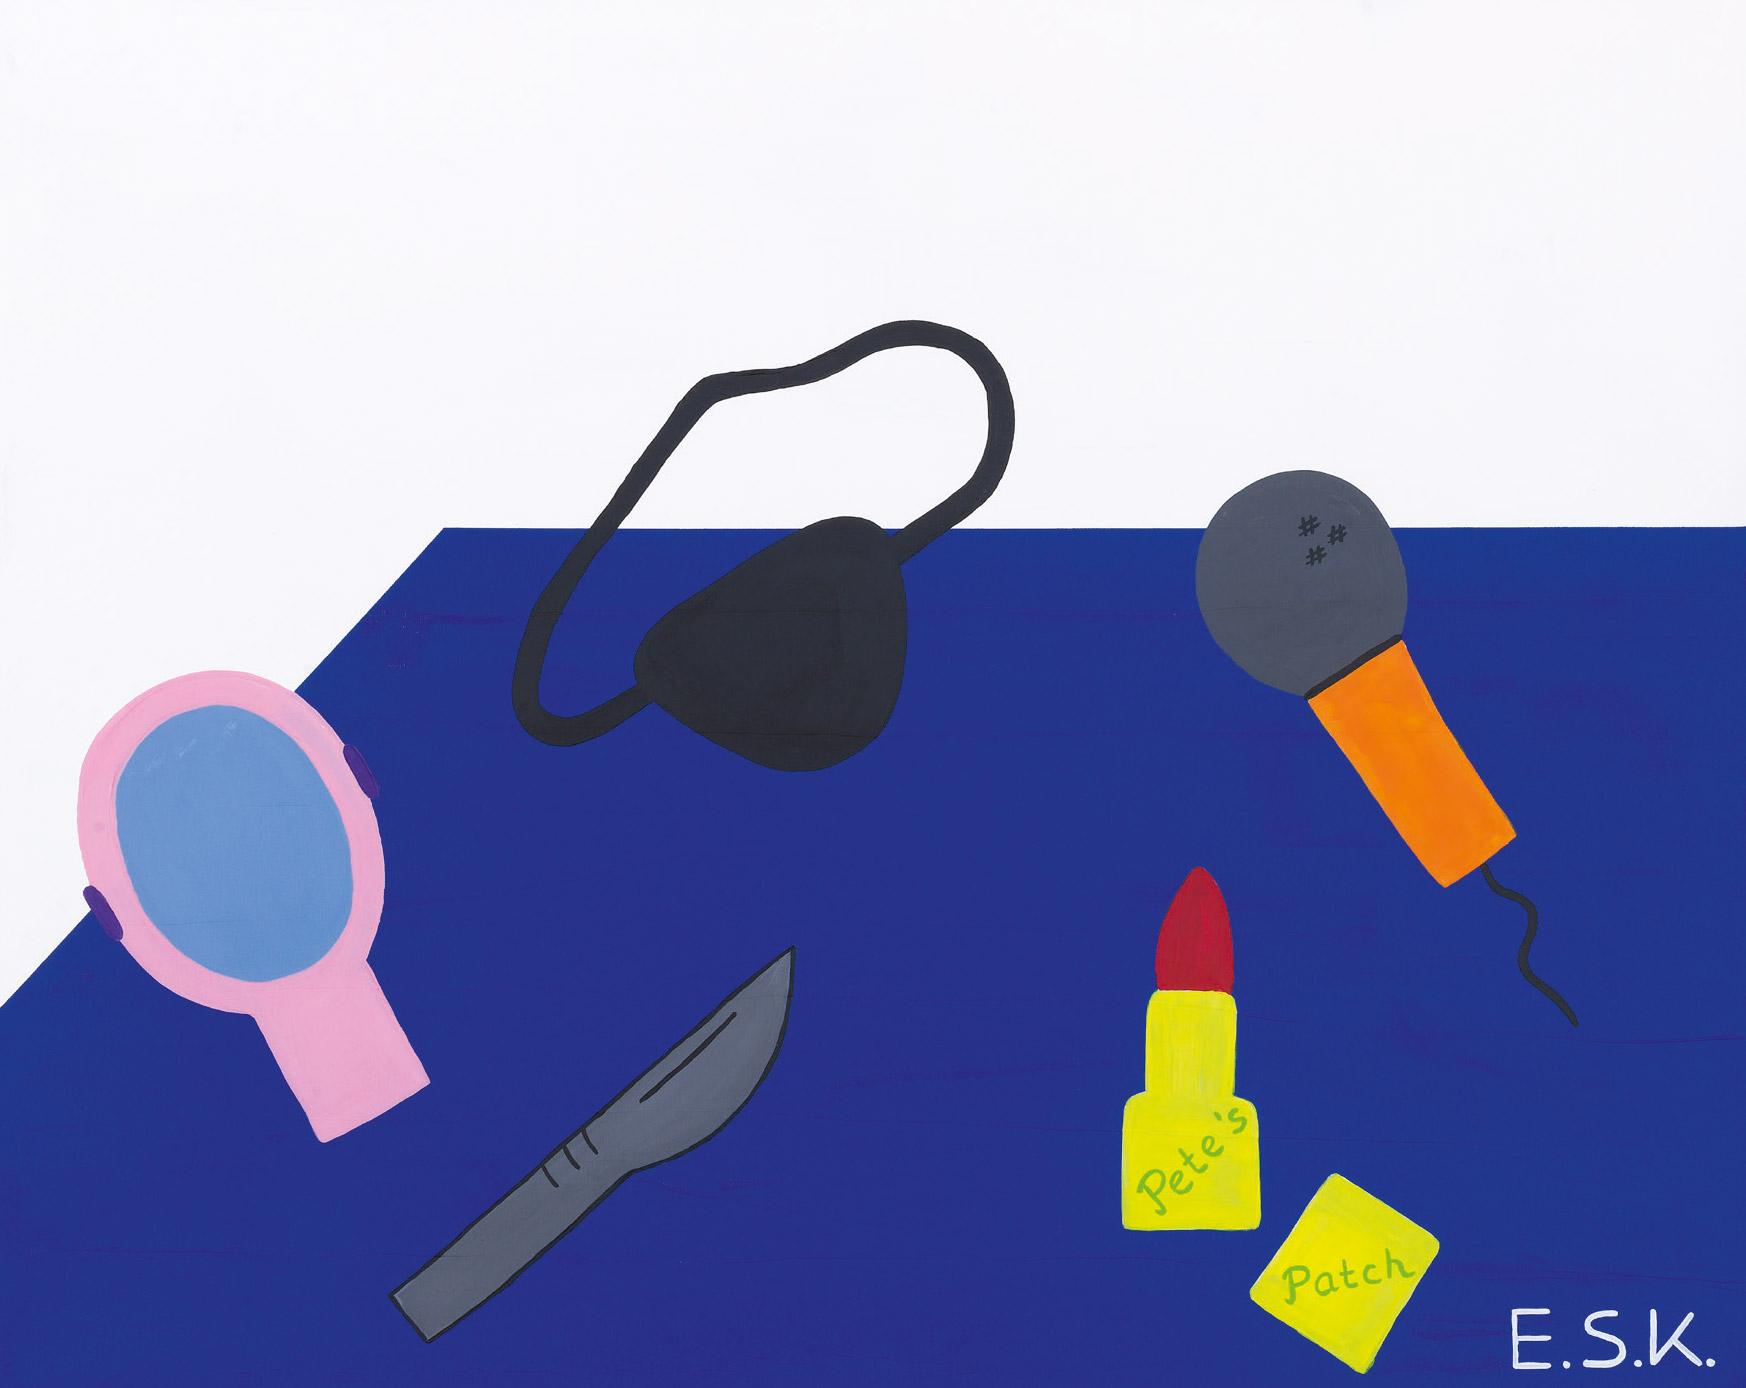 Plastic Surgery Pop Art by E.S.K. Eileen Susanne Kreipl